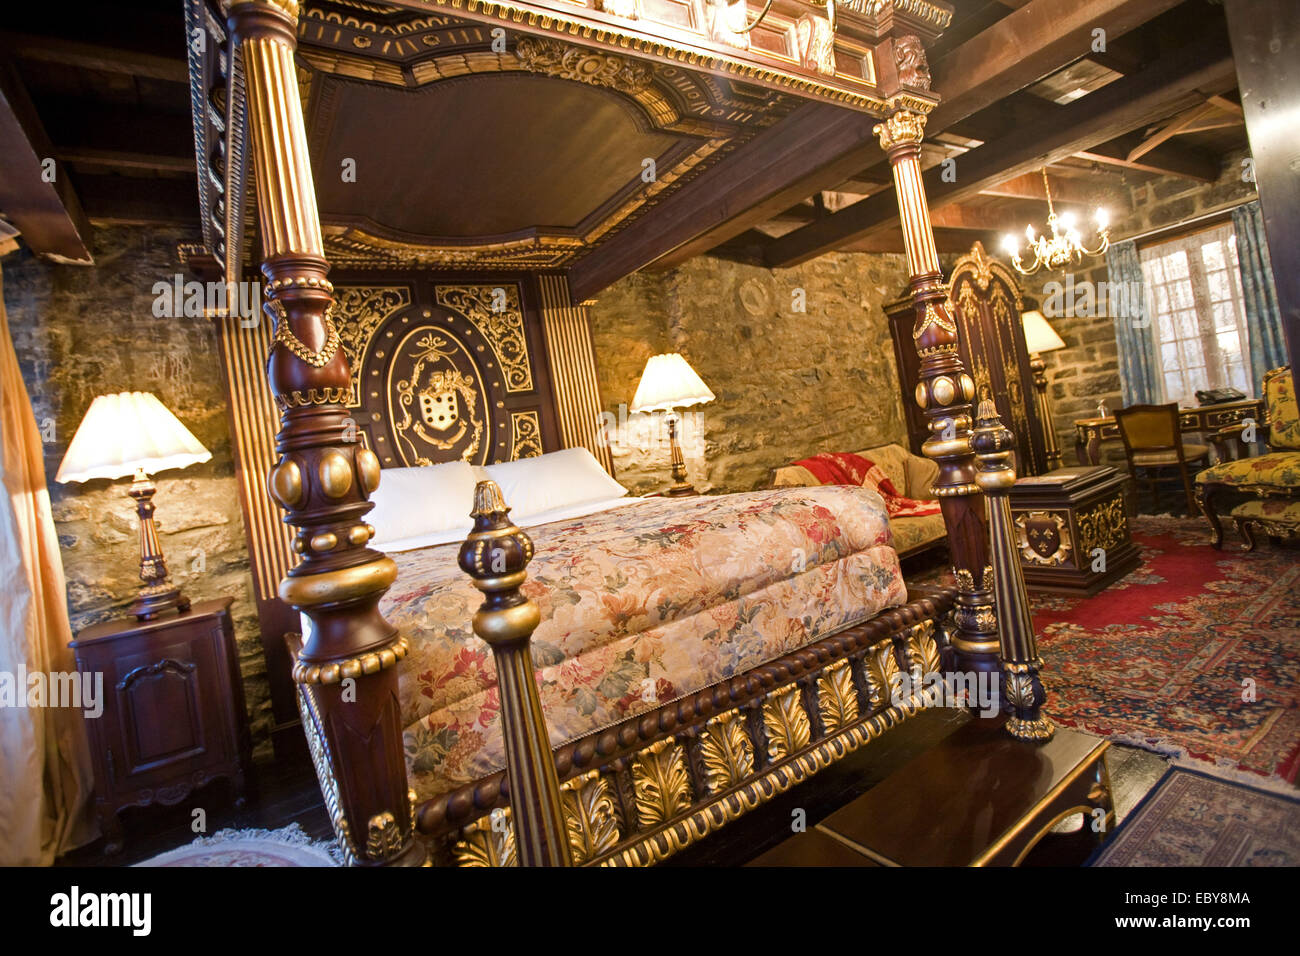 Hotel - la Maison Pierre du Calvet bedroom interior, Old ...